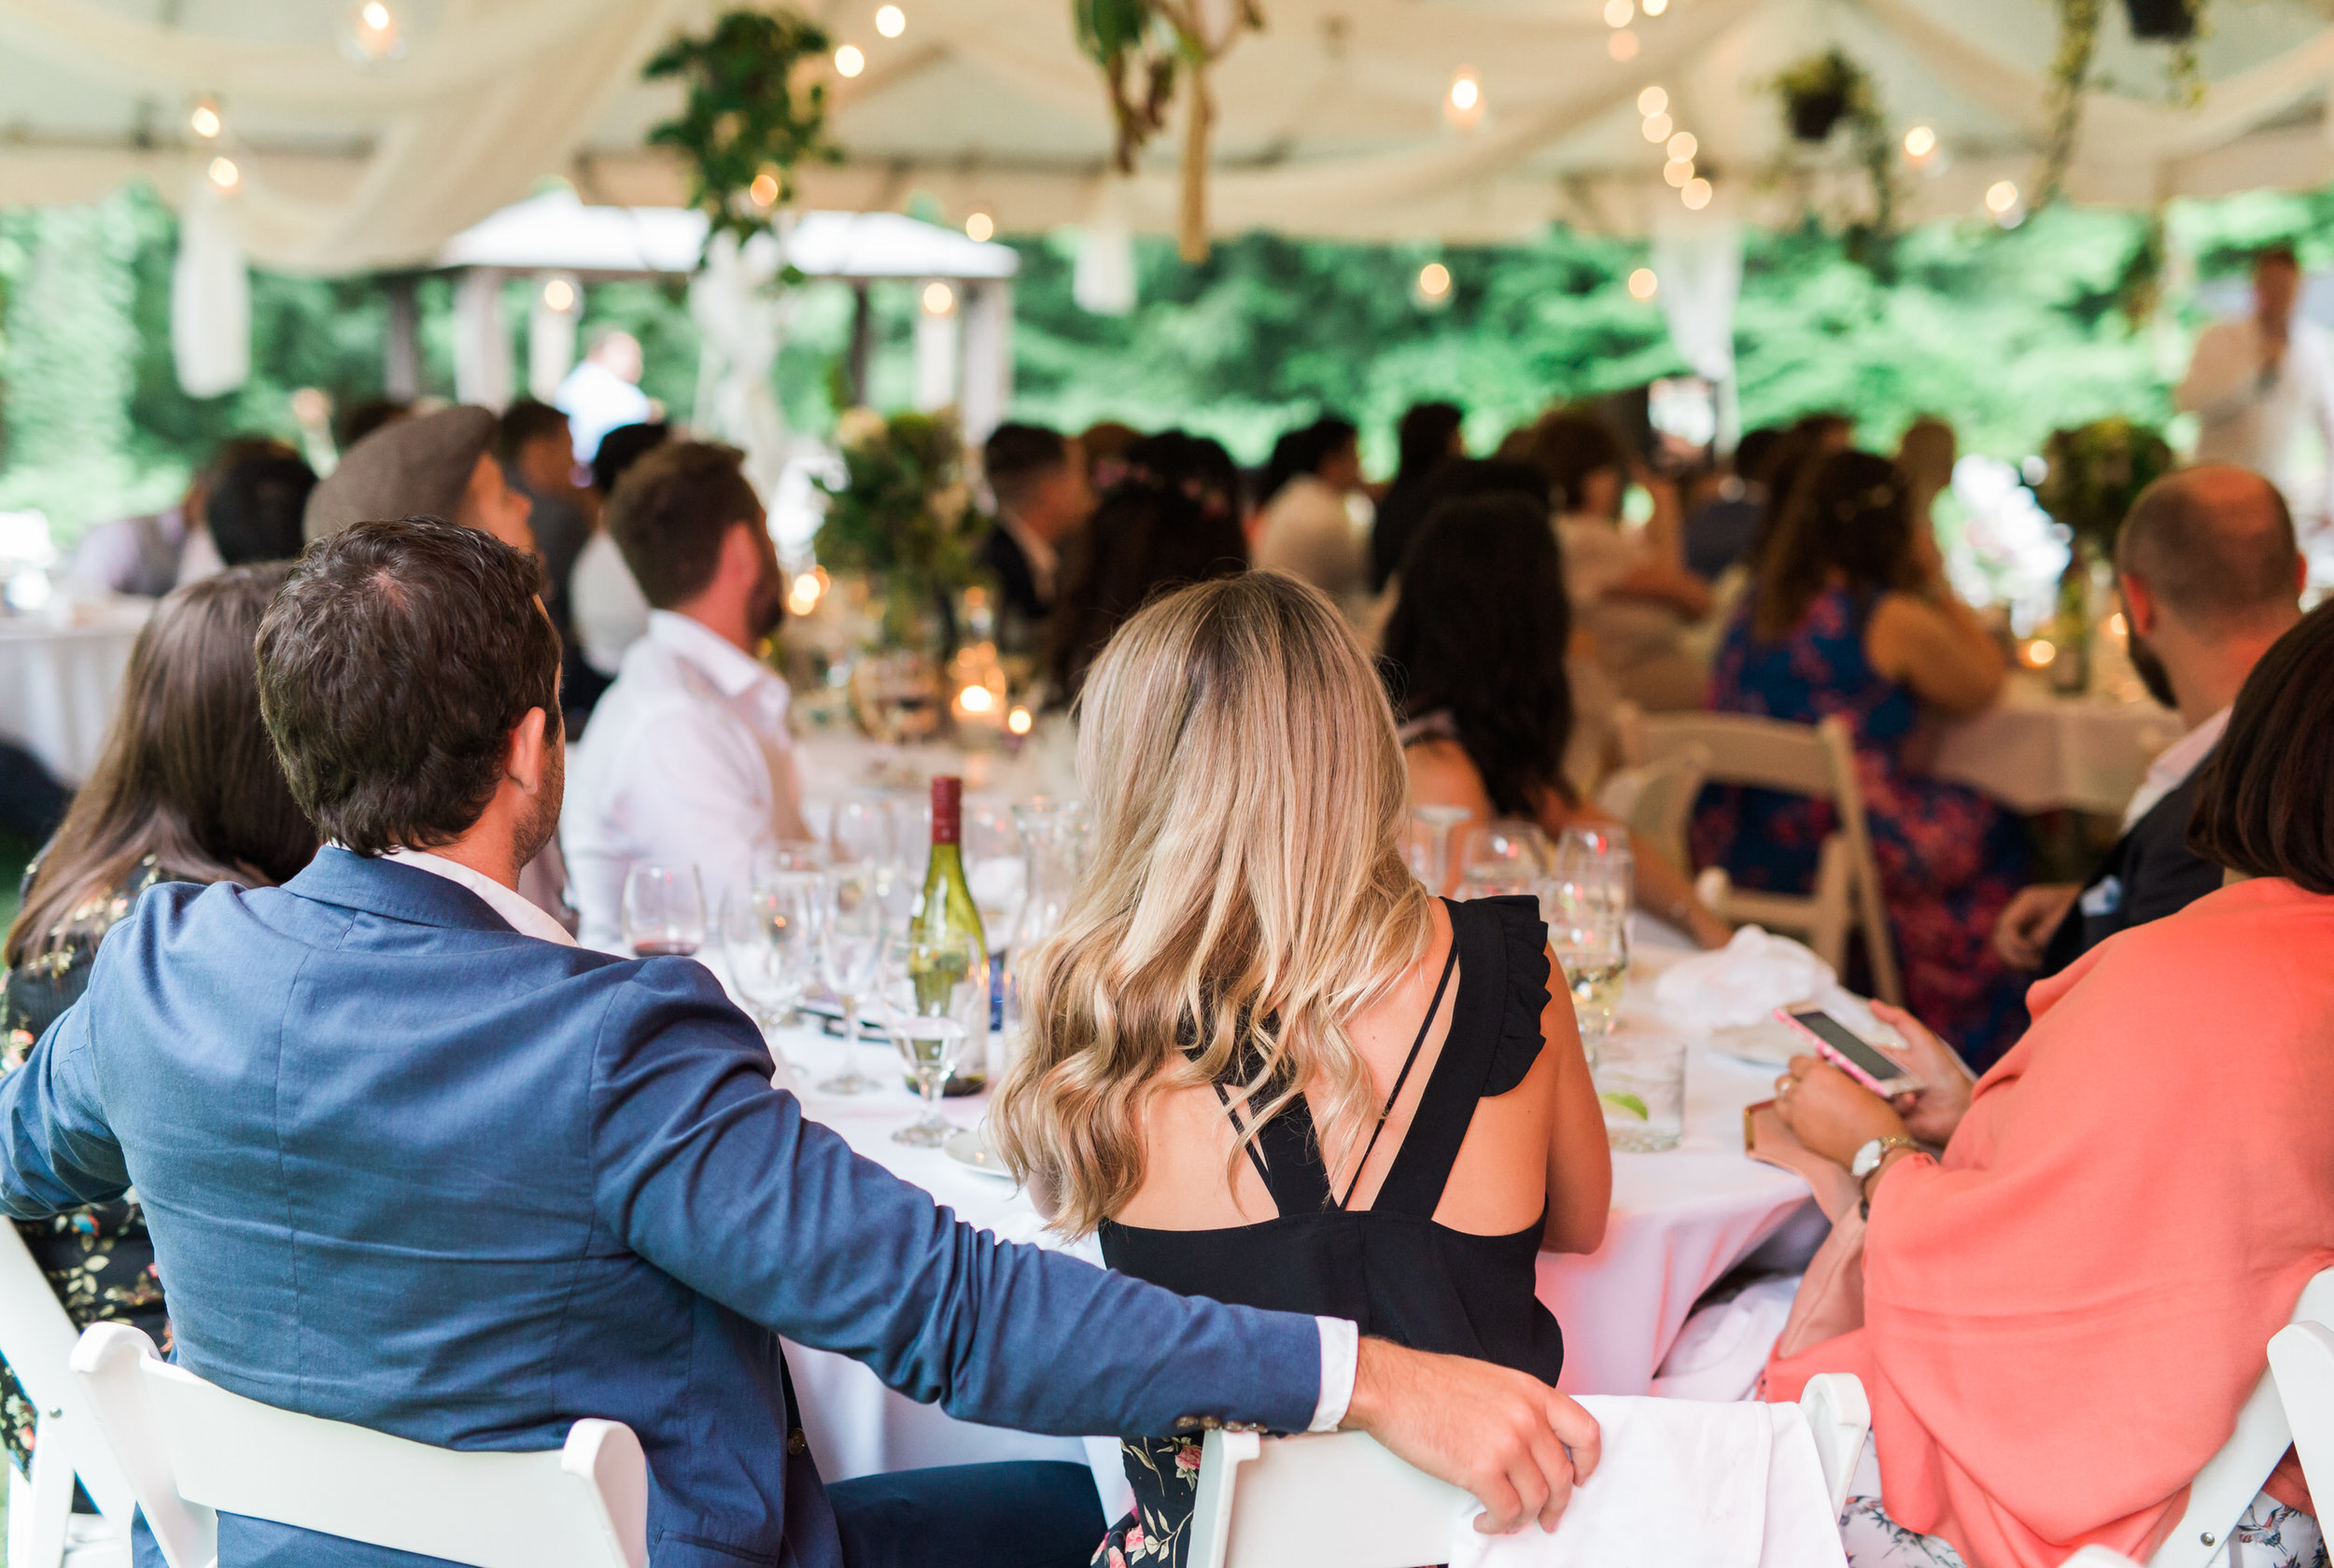 Linwood House Wedding Photos - Roberts Creek Wedding Photos - Vancouver Wedding Photographer & Videographer - Sunshine Coast Wedding Photos - Sunshine Coast Wedding Photographer - Jennifer Picard Photography - IMG_9099.jpg